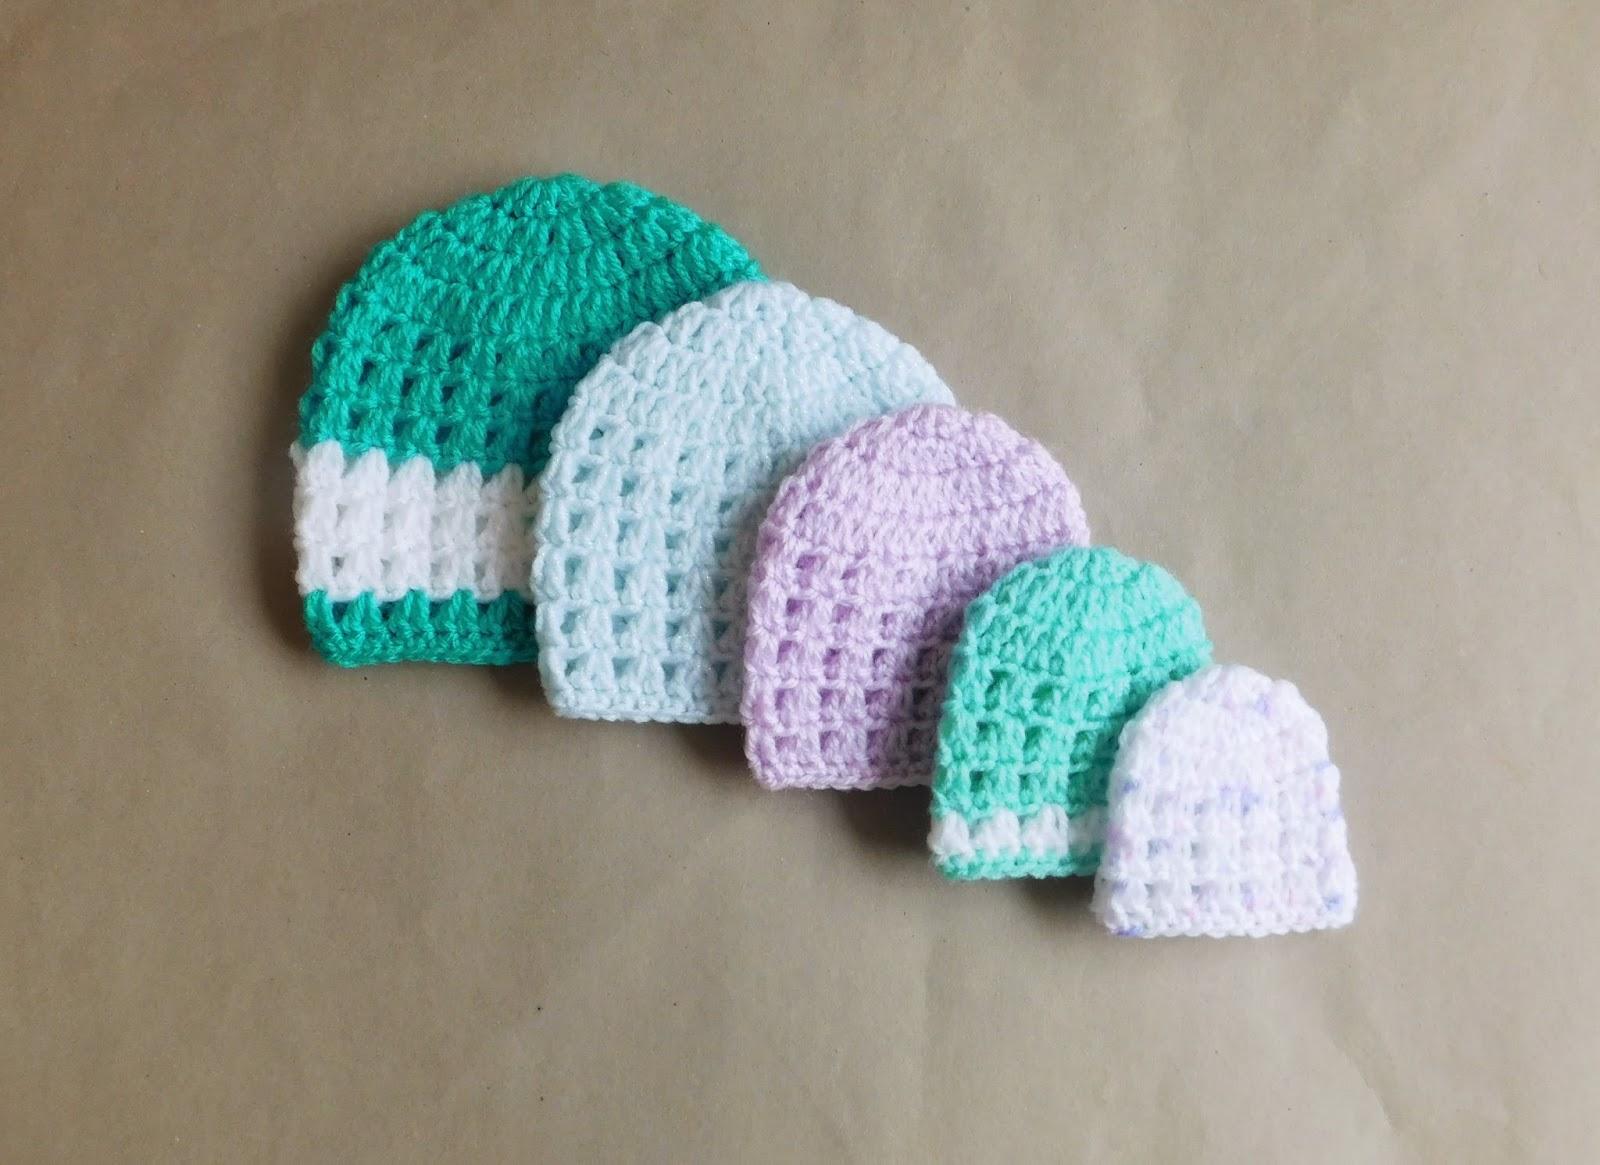 crochet baby hats valerie baby hats 0-3months small newborn large preemie medium preemie  small preemie nbukhdj